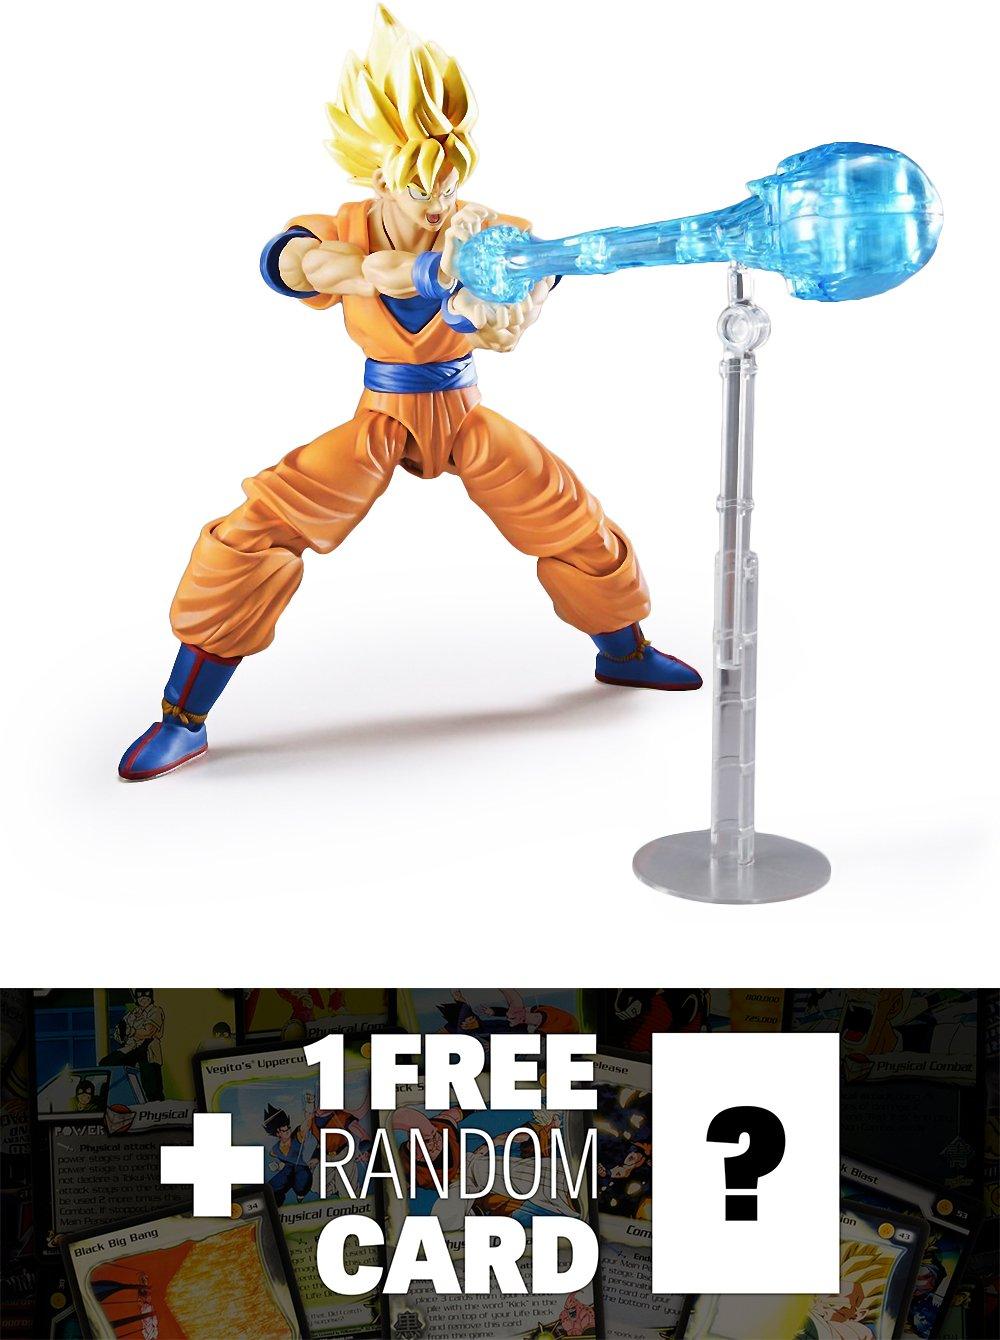 Super Saiyan Son Goku : DragonBall Z X figure-rise標準モデルキット+ 1 Free official Dragonballバンドル B01LZ7YNM5